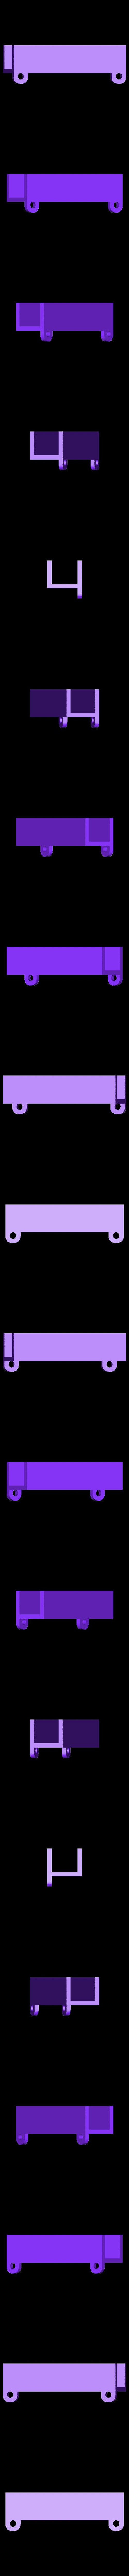 fhlebyj.STL Download free STL file rc crawler • 3D printing object, Boastcott